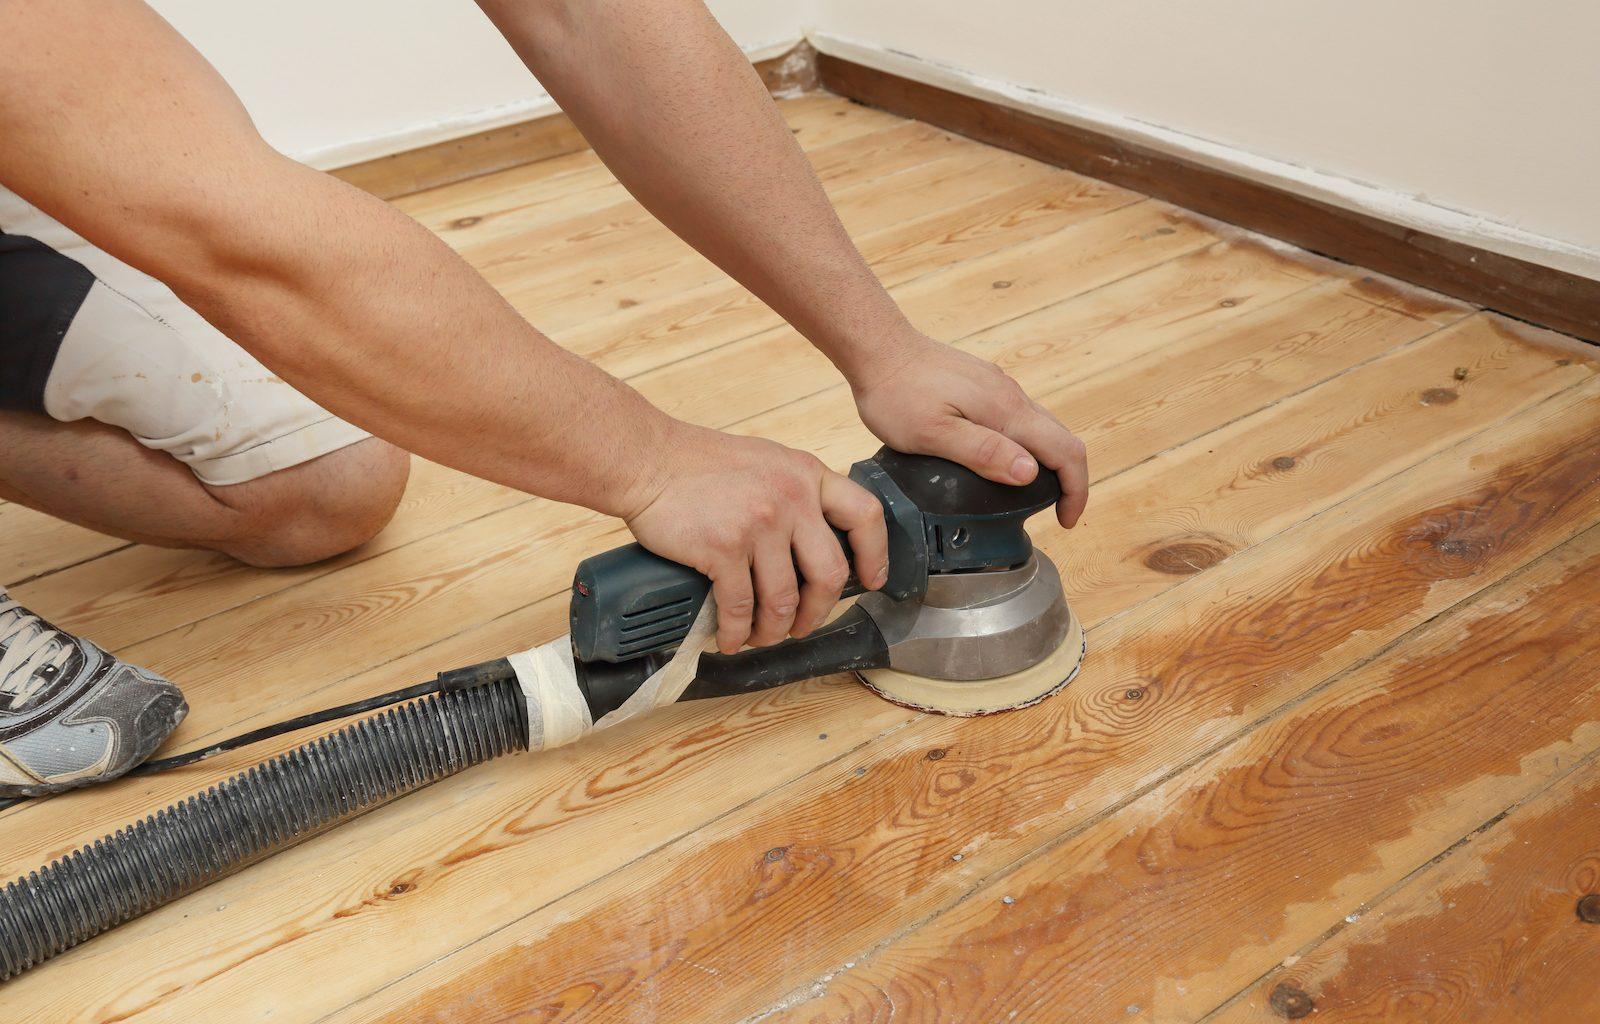 Hardwood floor orbital sander being used